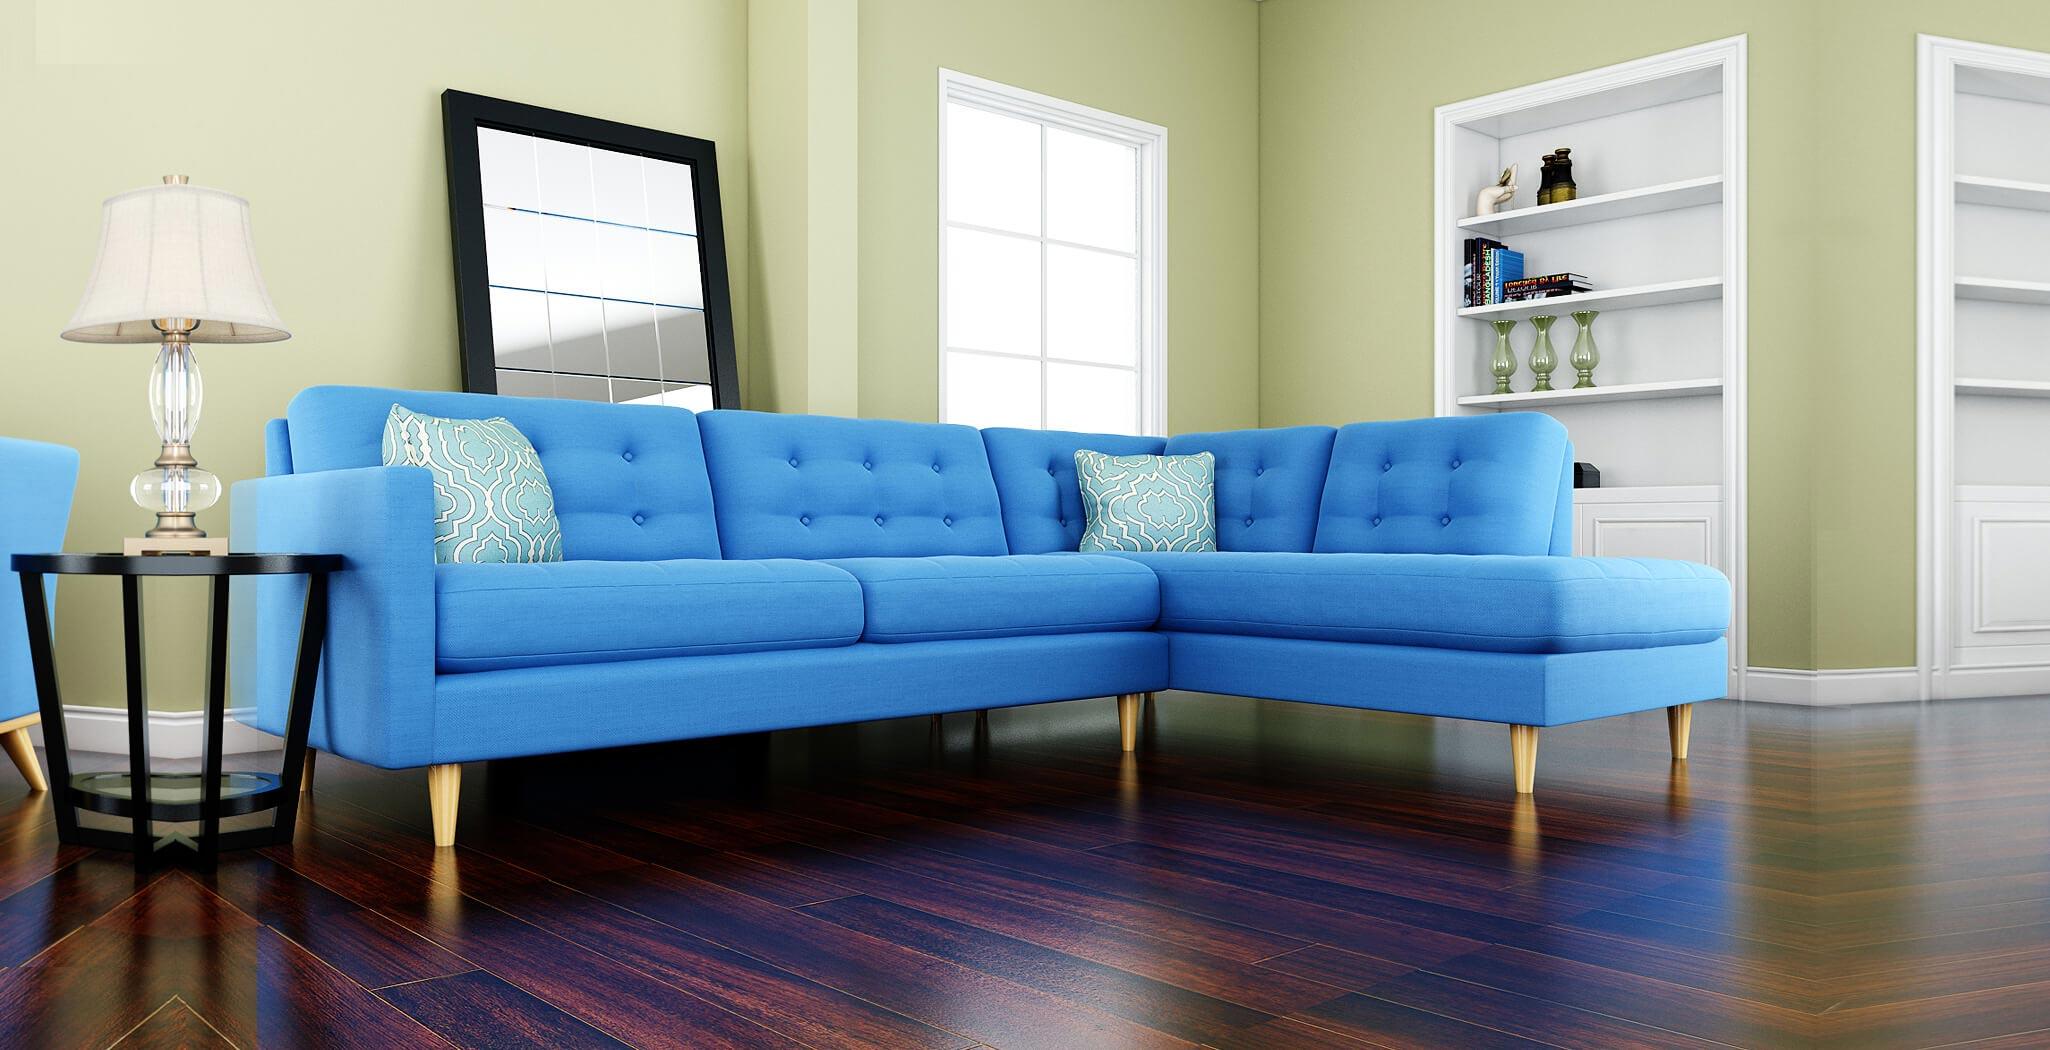 oslo panel furniture gallery 2